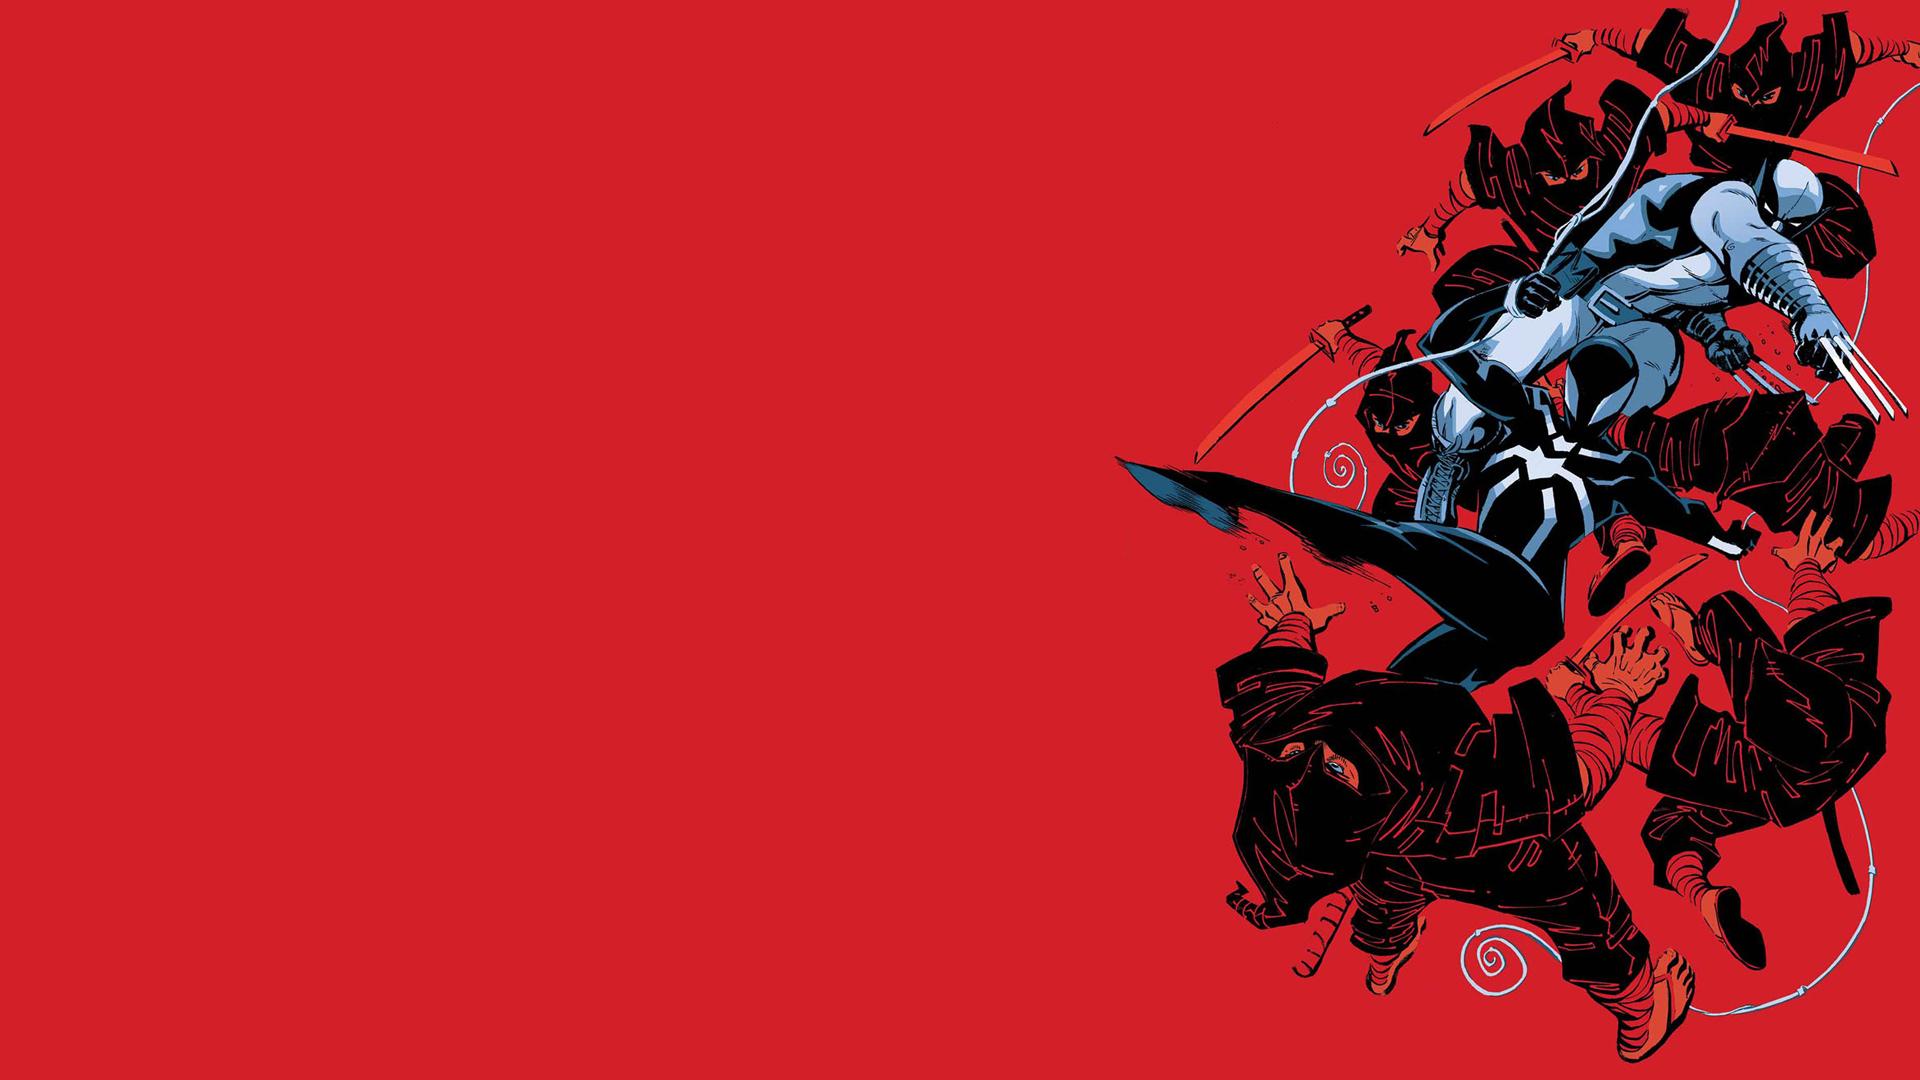 X Men Backgrounds Download 1920x1080